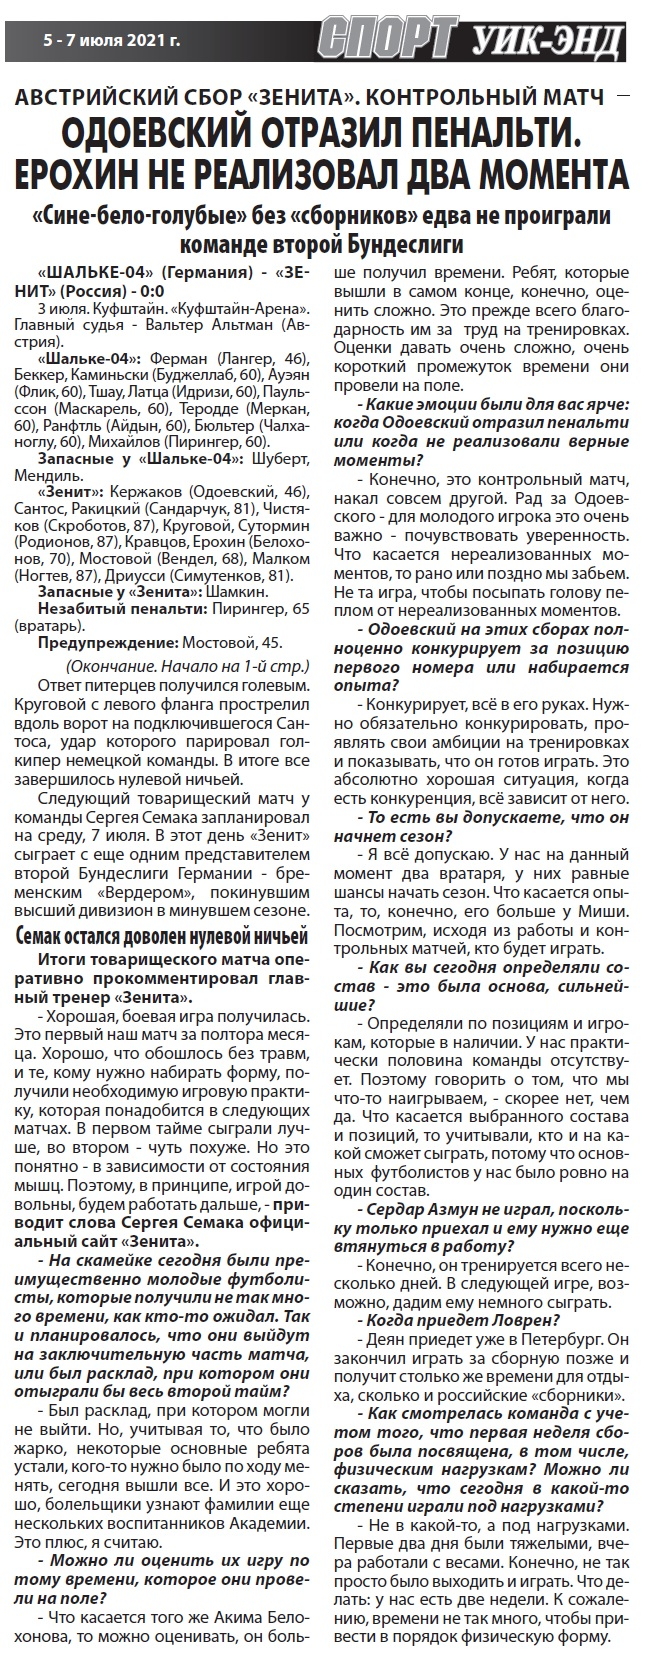 Зенит (Санкт-Петербург) - Шальке-04 (Гельзенкирхен, Германия) 0:0